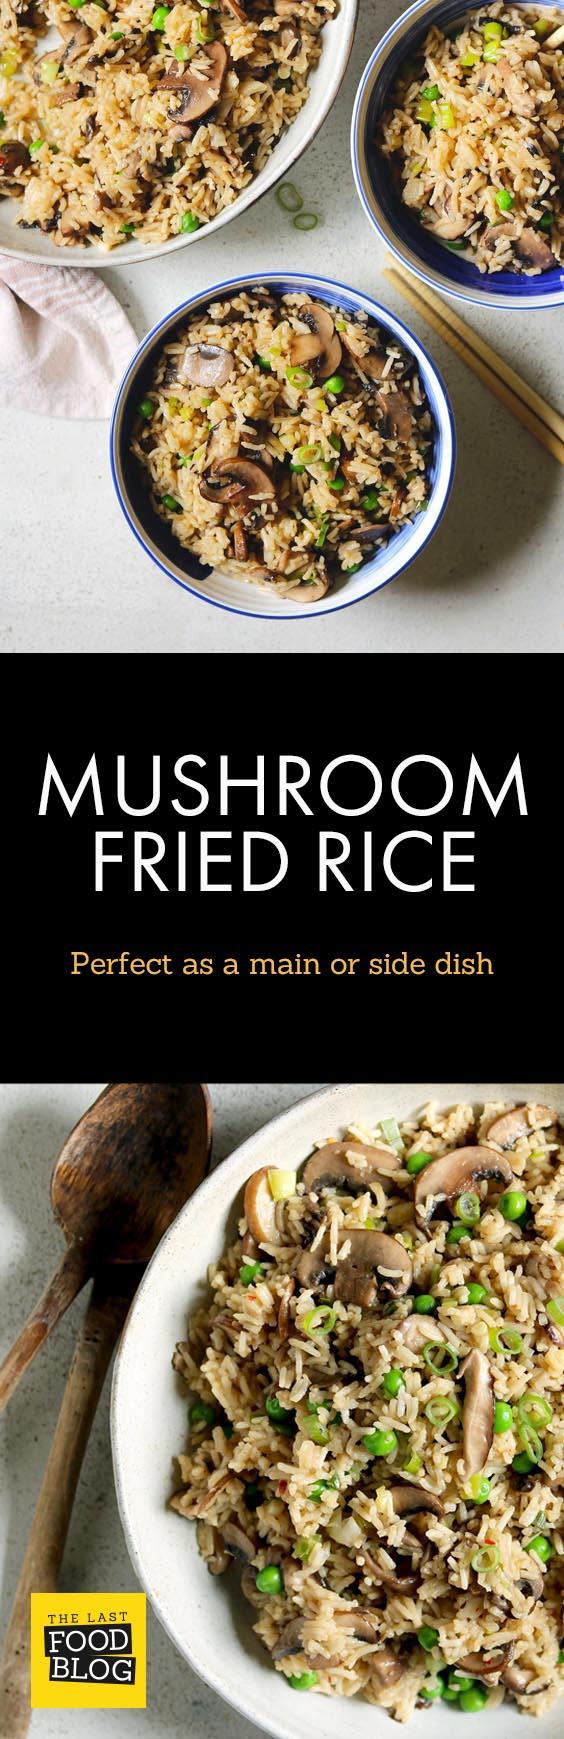 Mushroom Fried Rice - thelastfoodblog.com